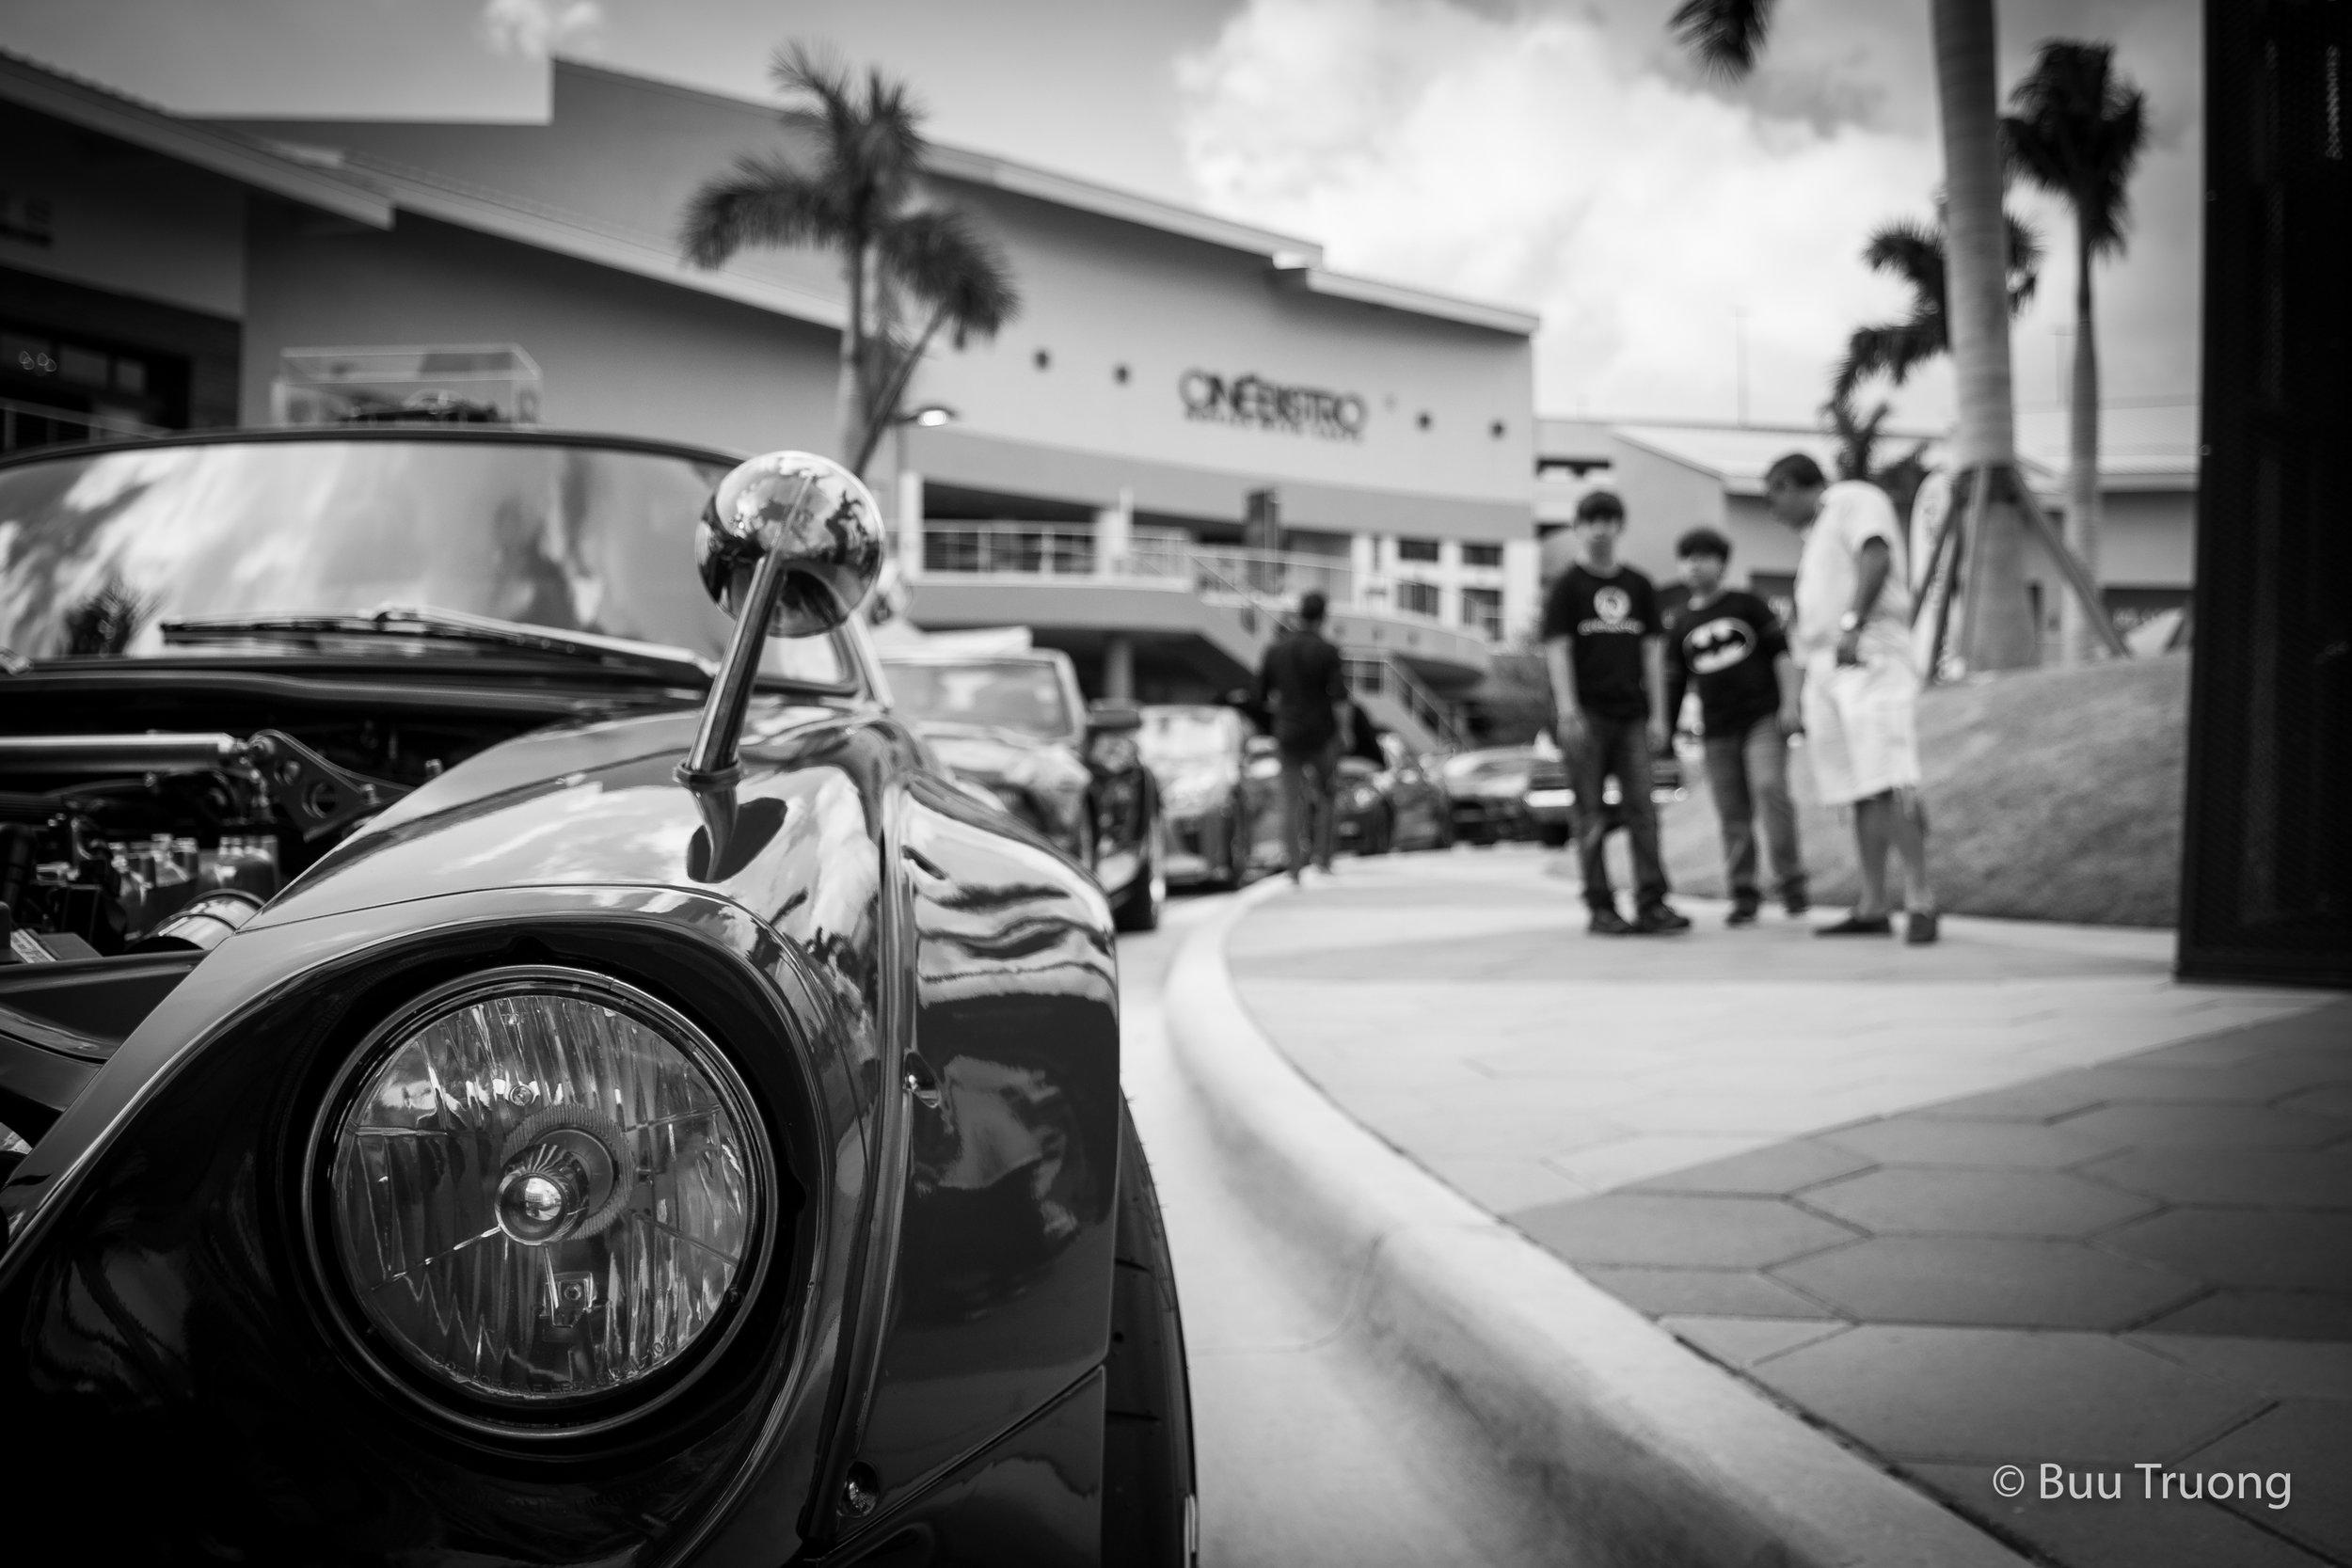 Doral Car Show - Admiring from Afar